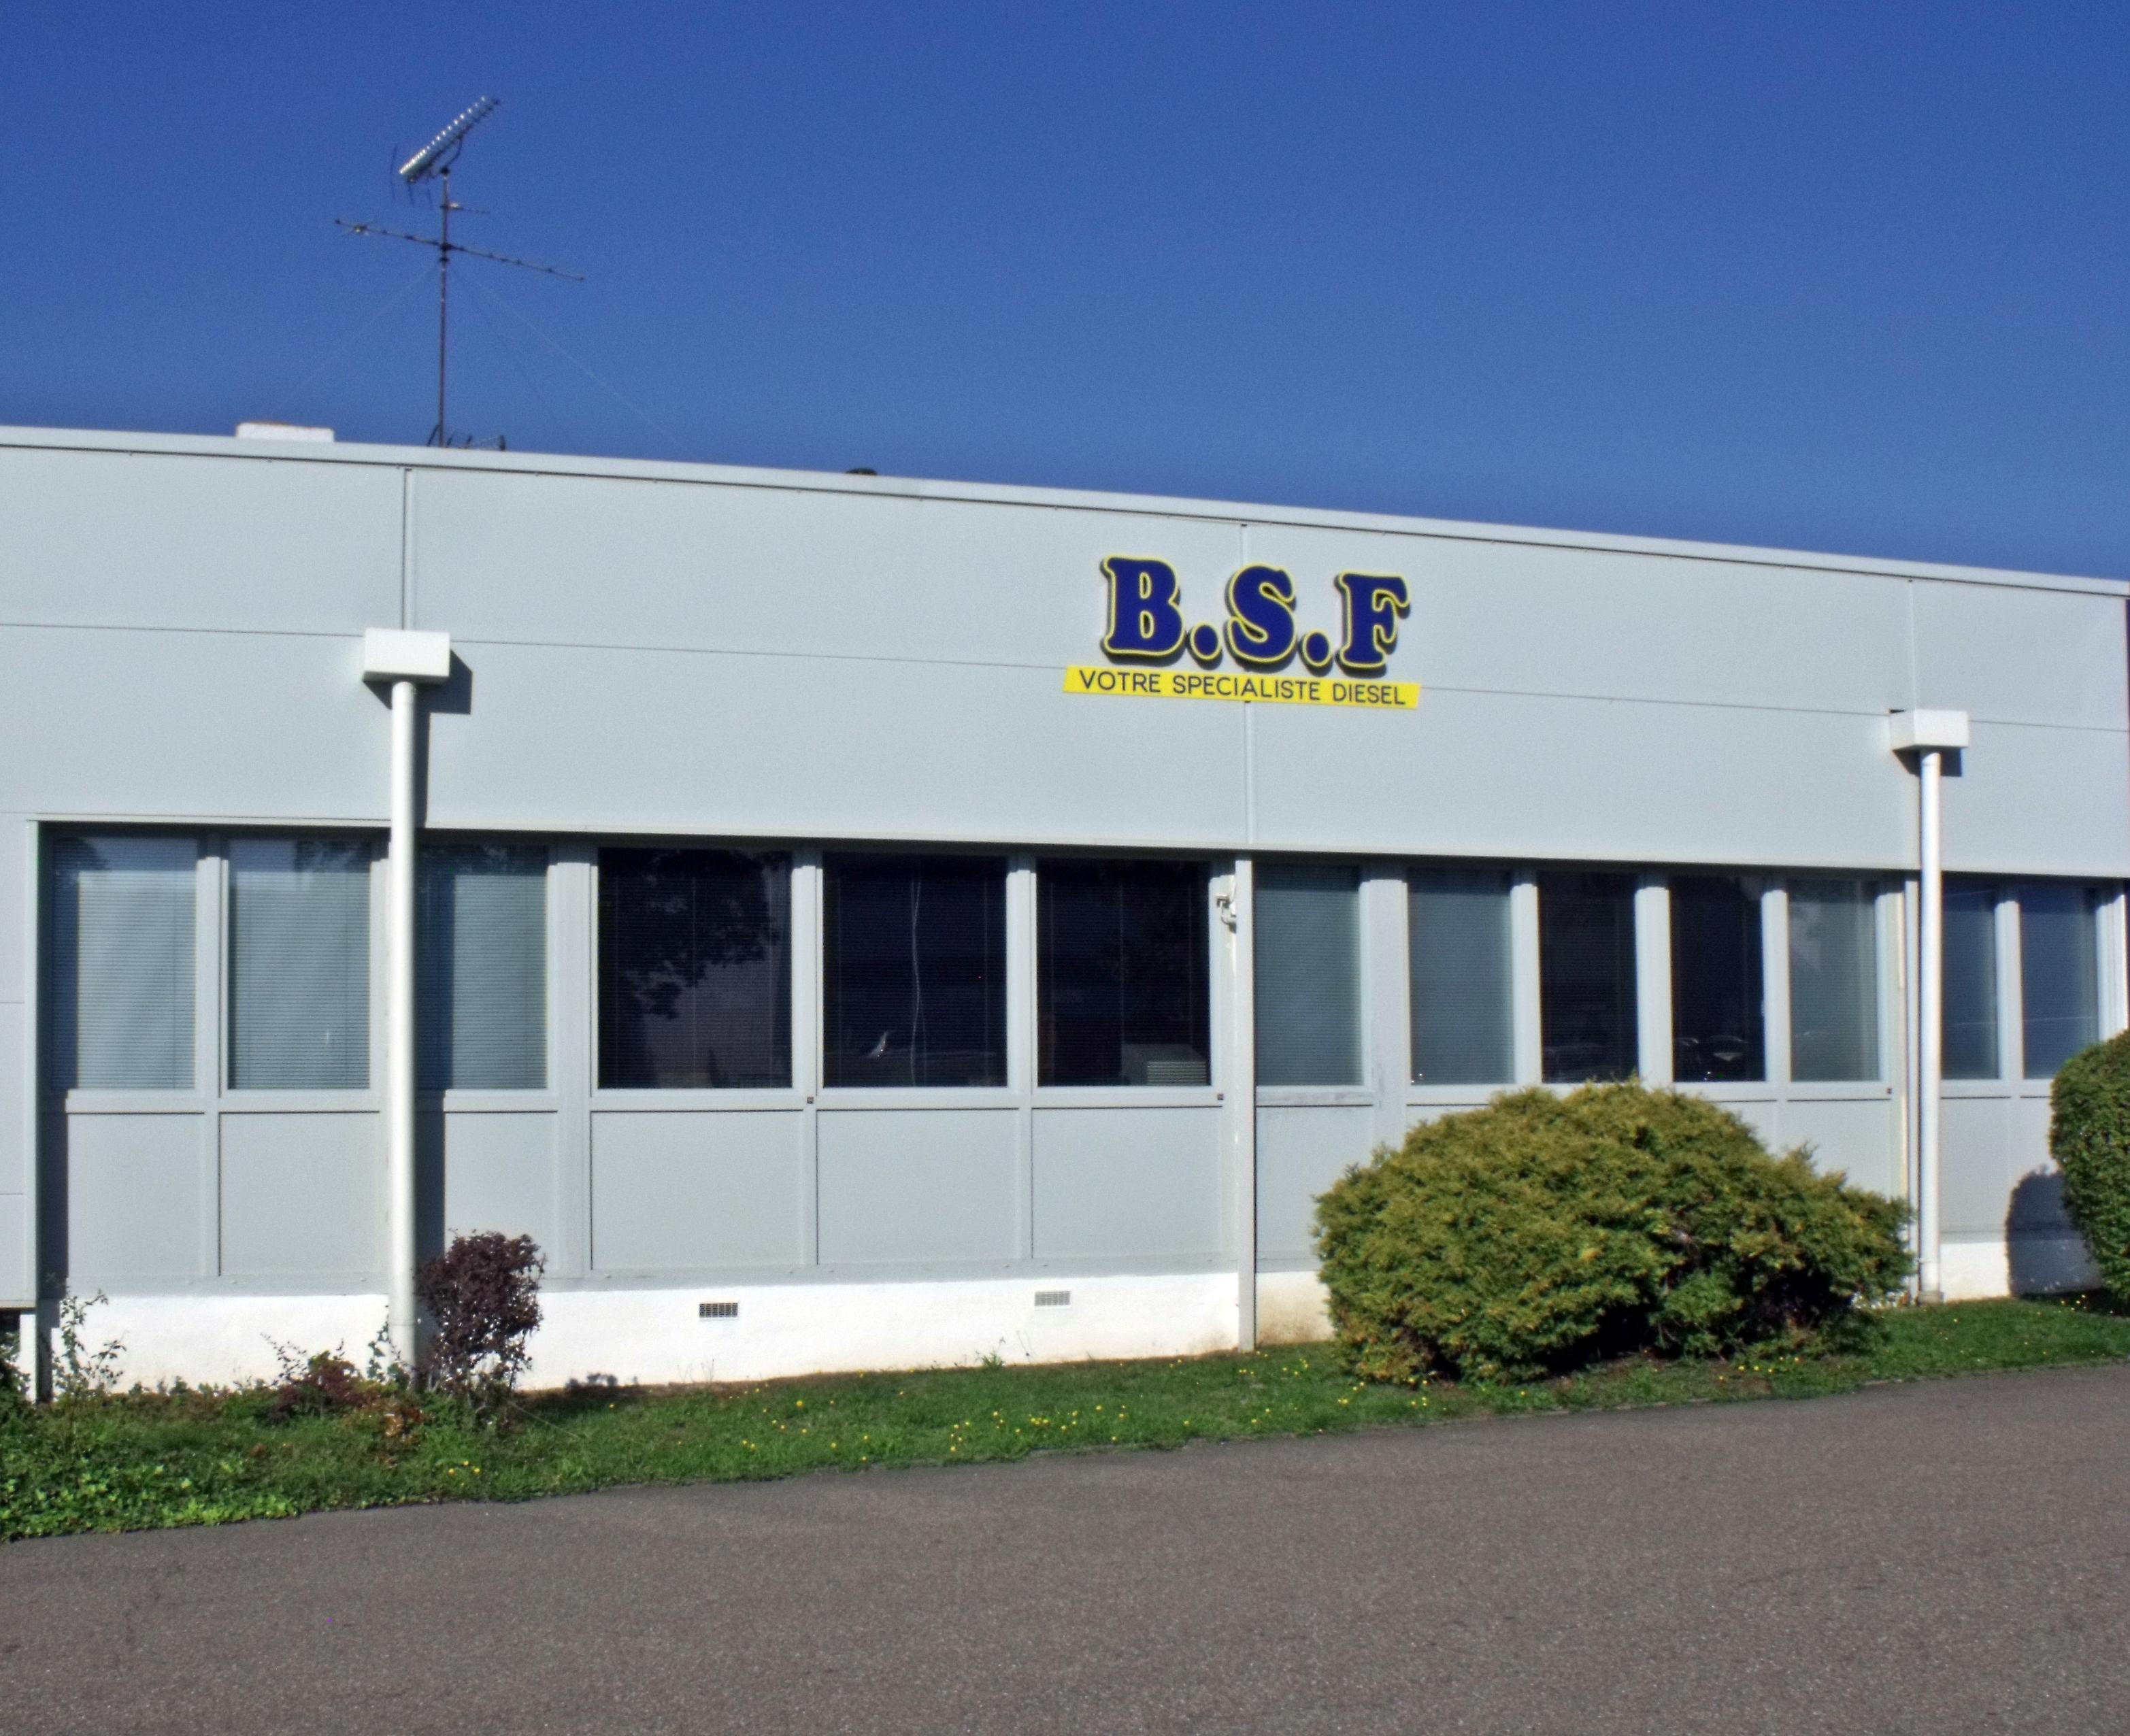 B s f garage le sp cialiste diesel for Garage ford metz borny